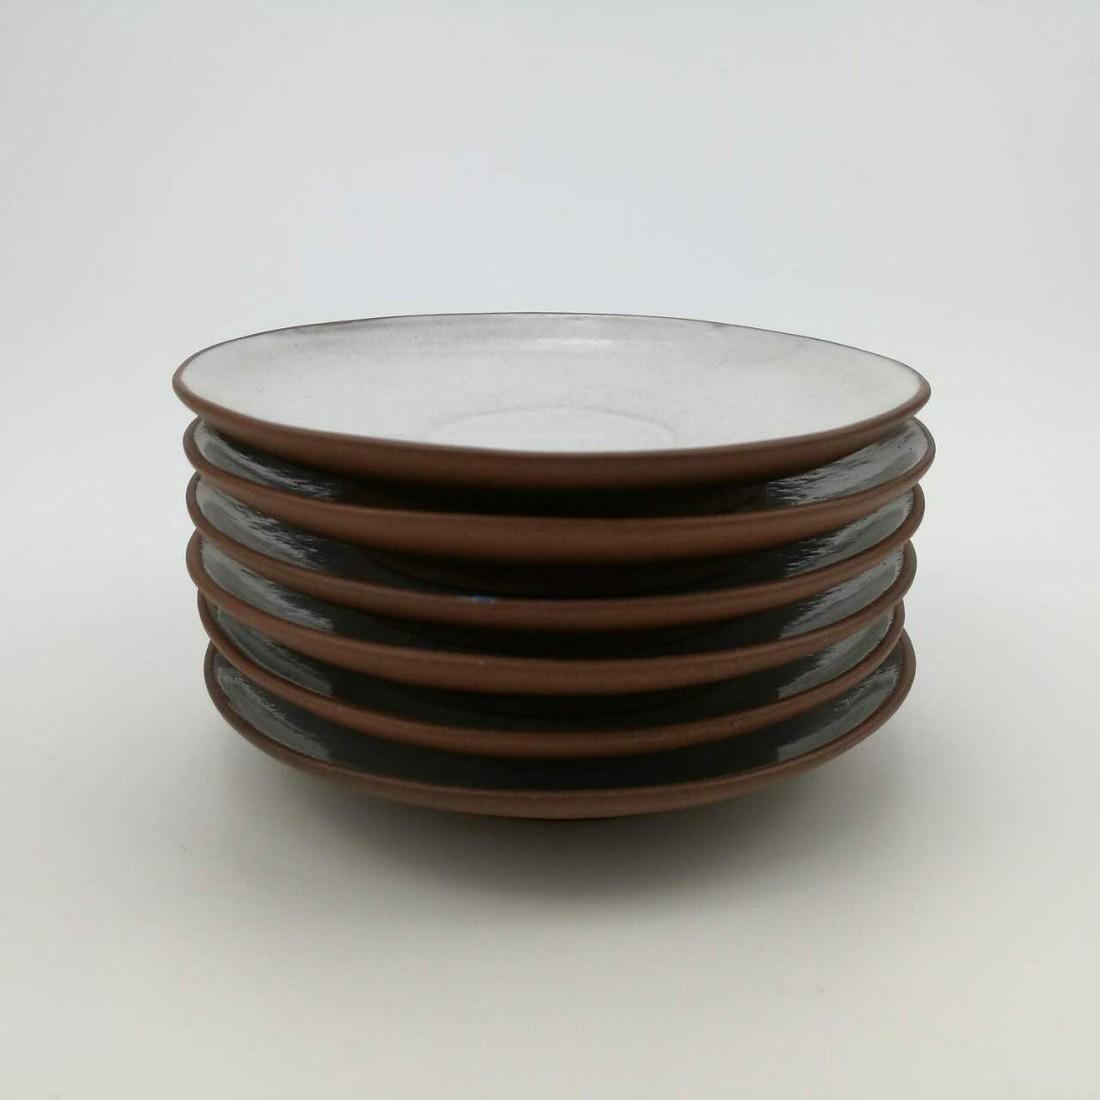 Antipue Chinese TIE HUA XUAN ZI-SHA 6 Pcs Plates